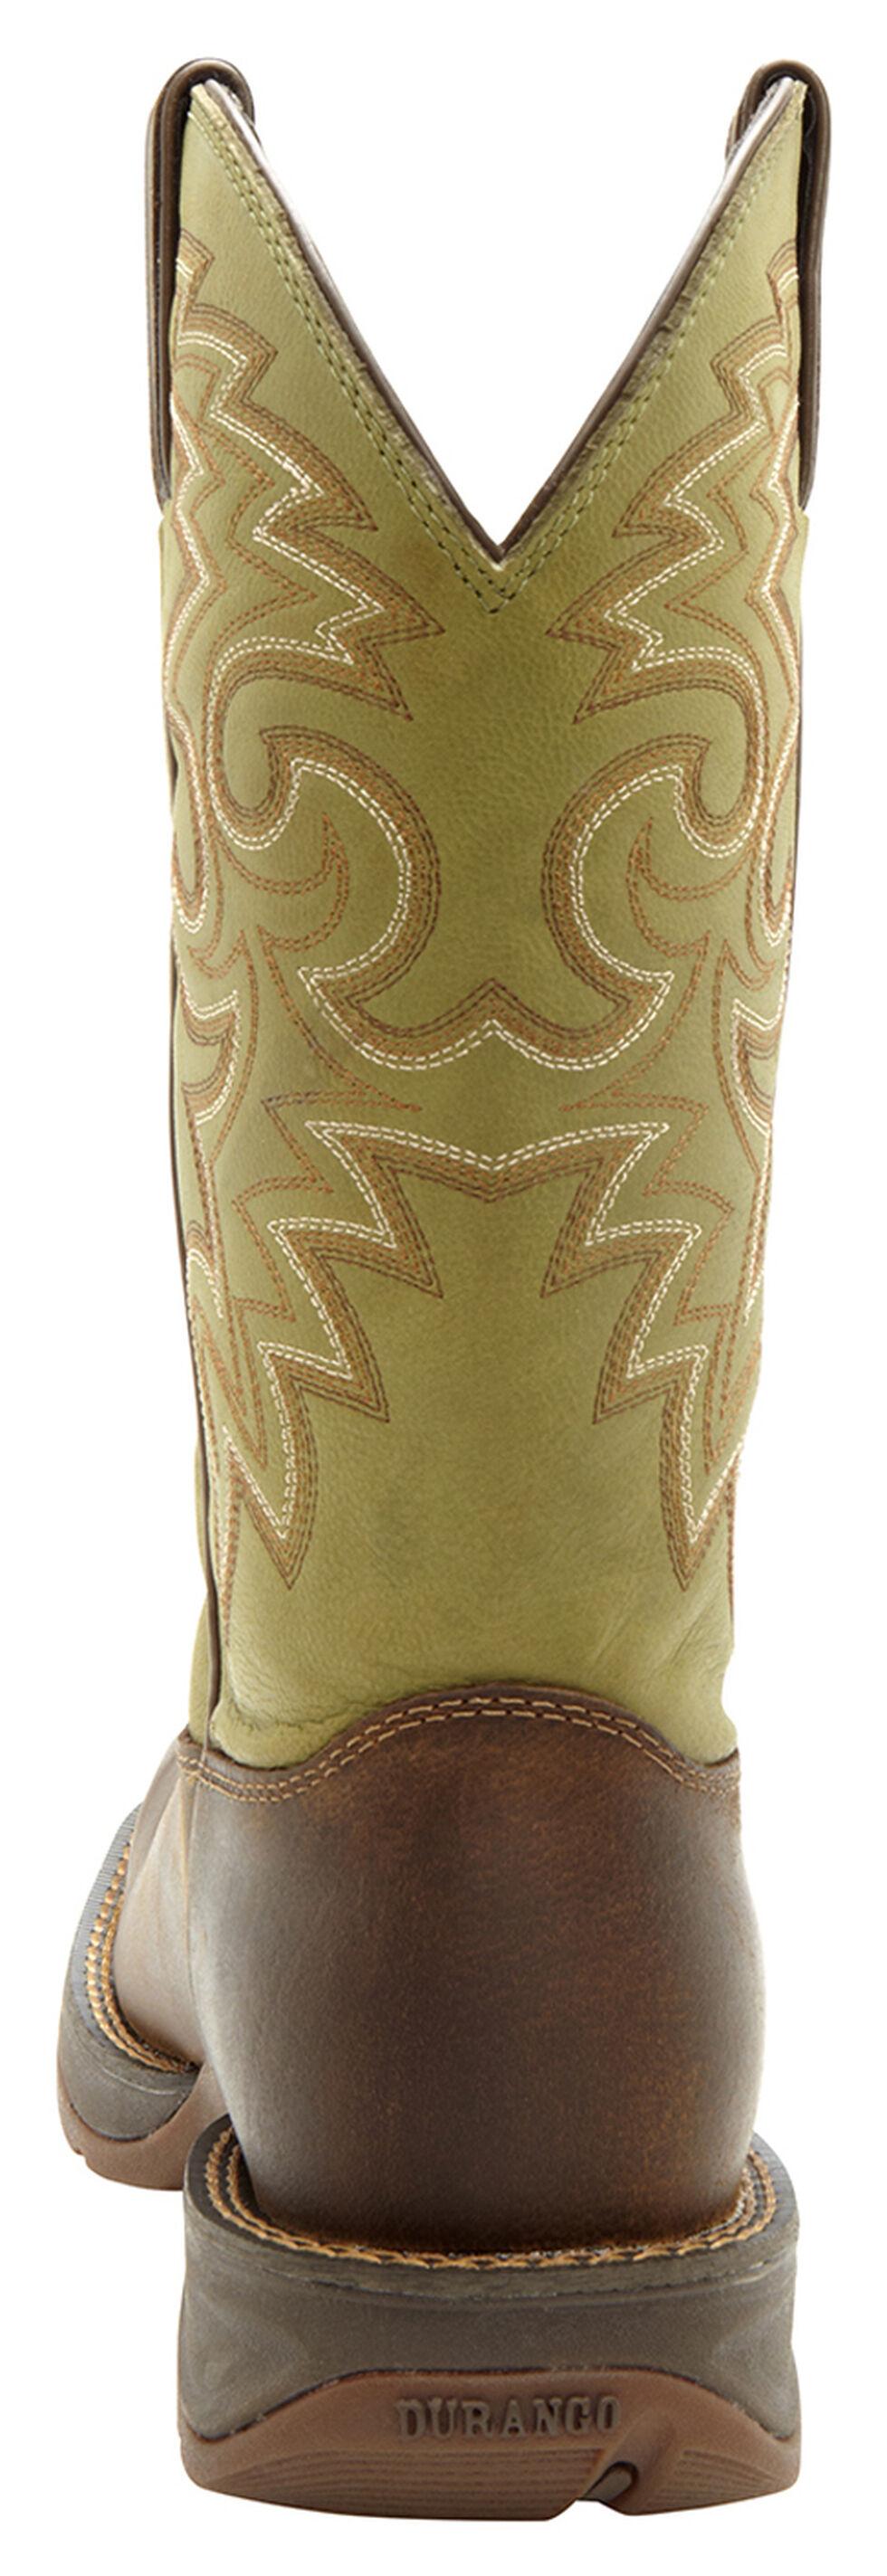 Durango Rebel Men's Coffee & Cactus Western Boots - Square Toe, Coffee, hi-res